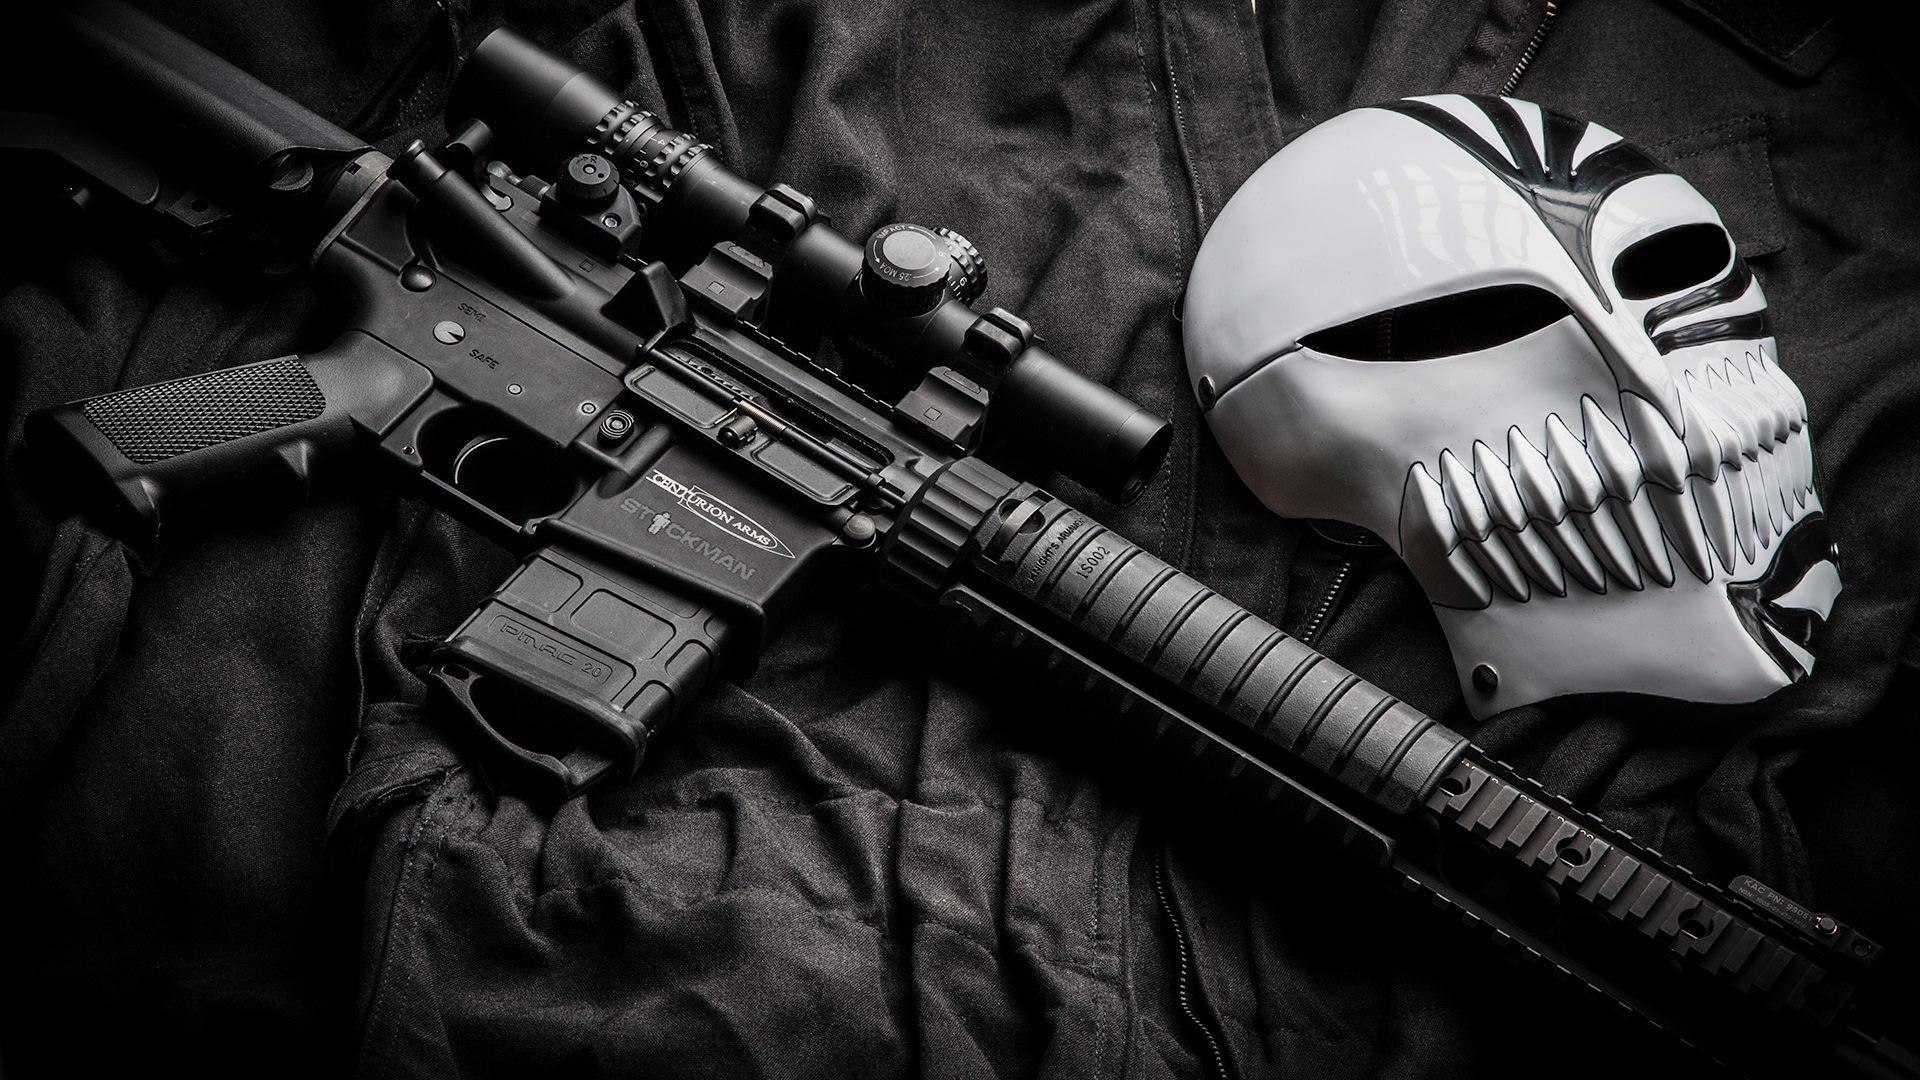 gun wallpapers for desktop (51+ images)